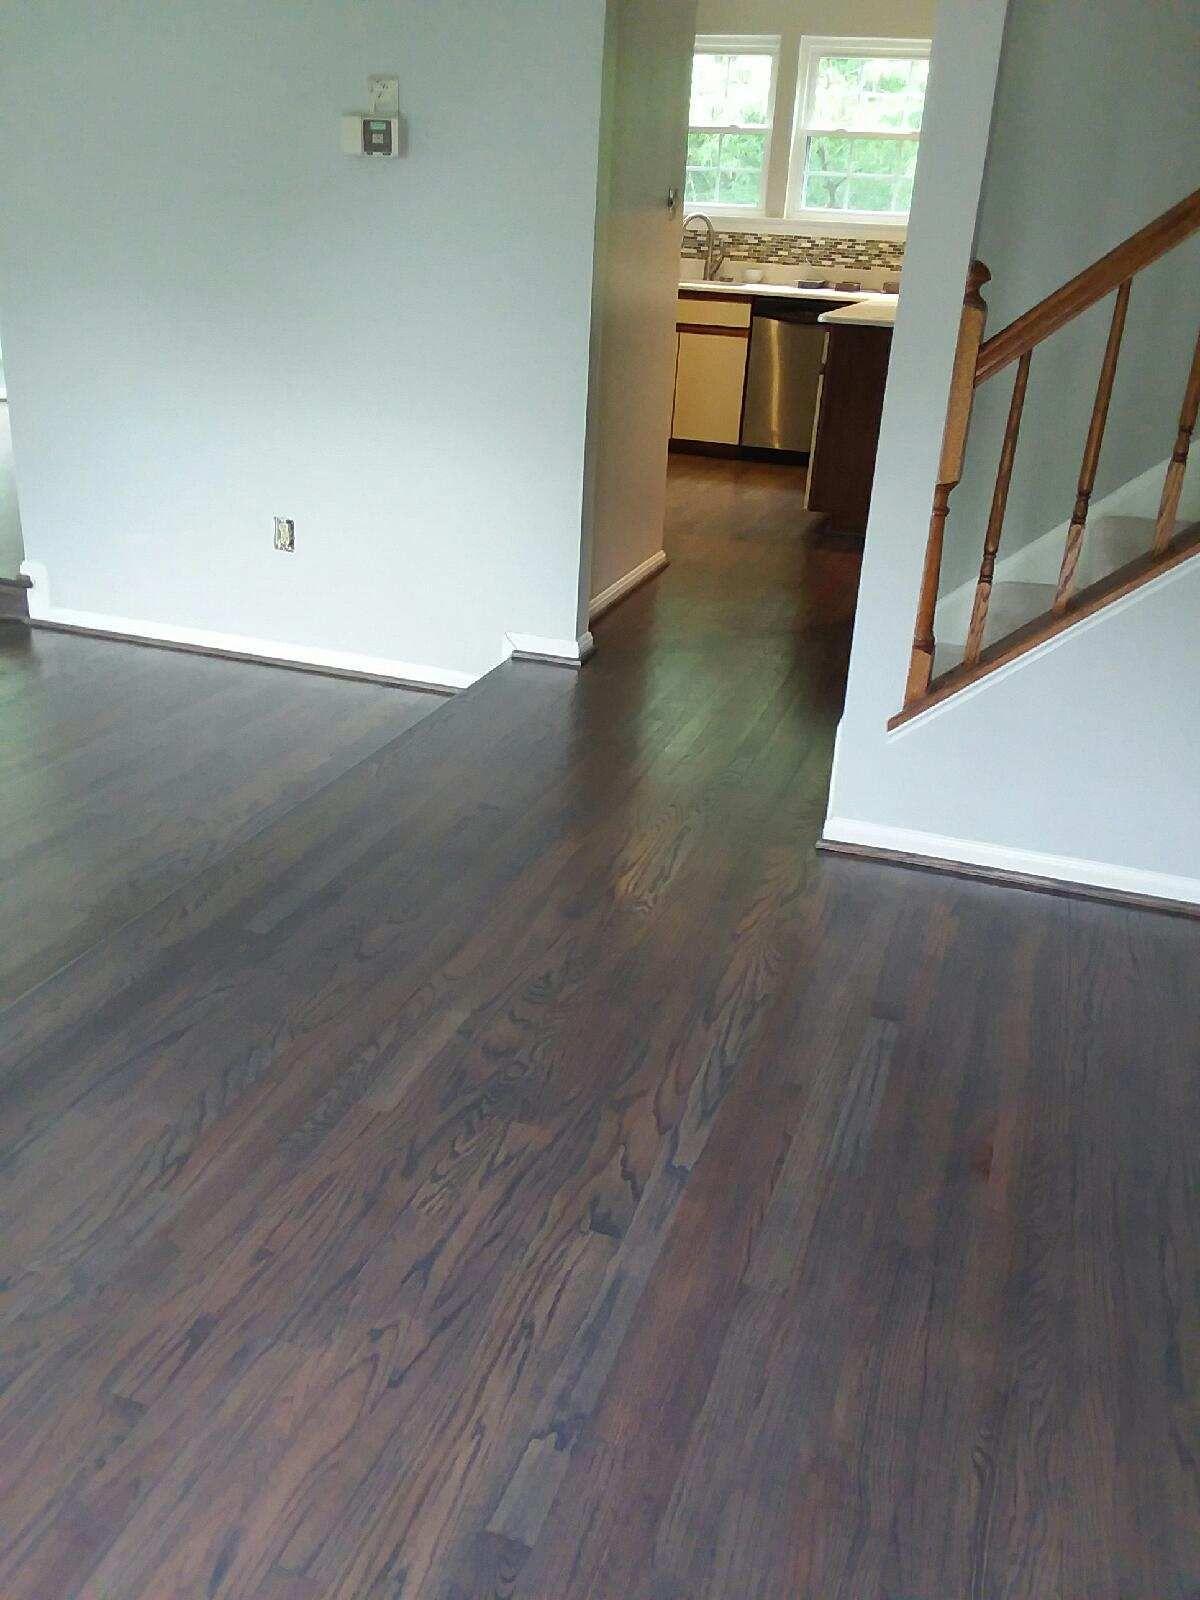 Minwax 50 Ebony And 50 Classic Gray Hardwood Floors With Repose Gray Sherwin Williams Refinishing Hardwood Floors Hardwood Floors Refinishing Floors